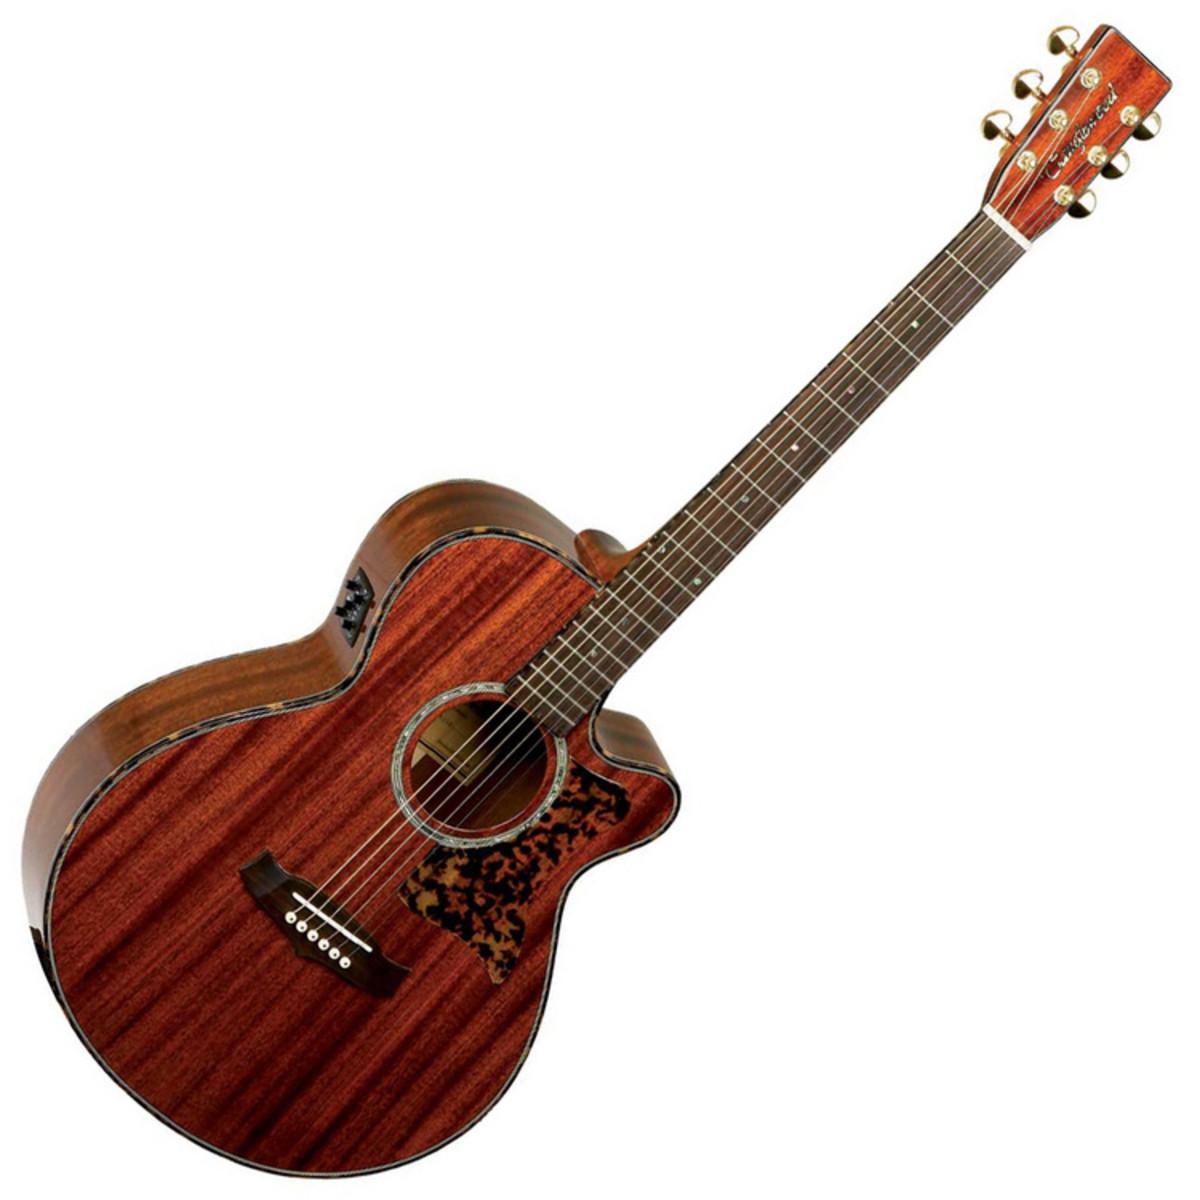 Tanglewood chitarra acustica sundance tw47e usato a for The tanglewood